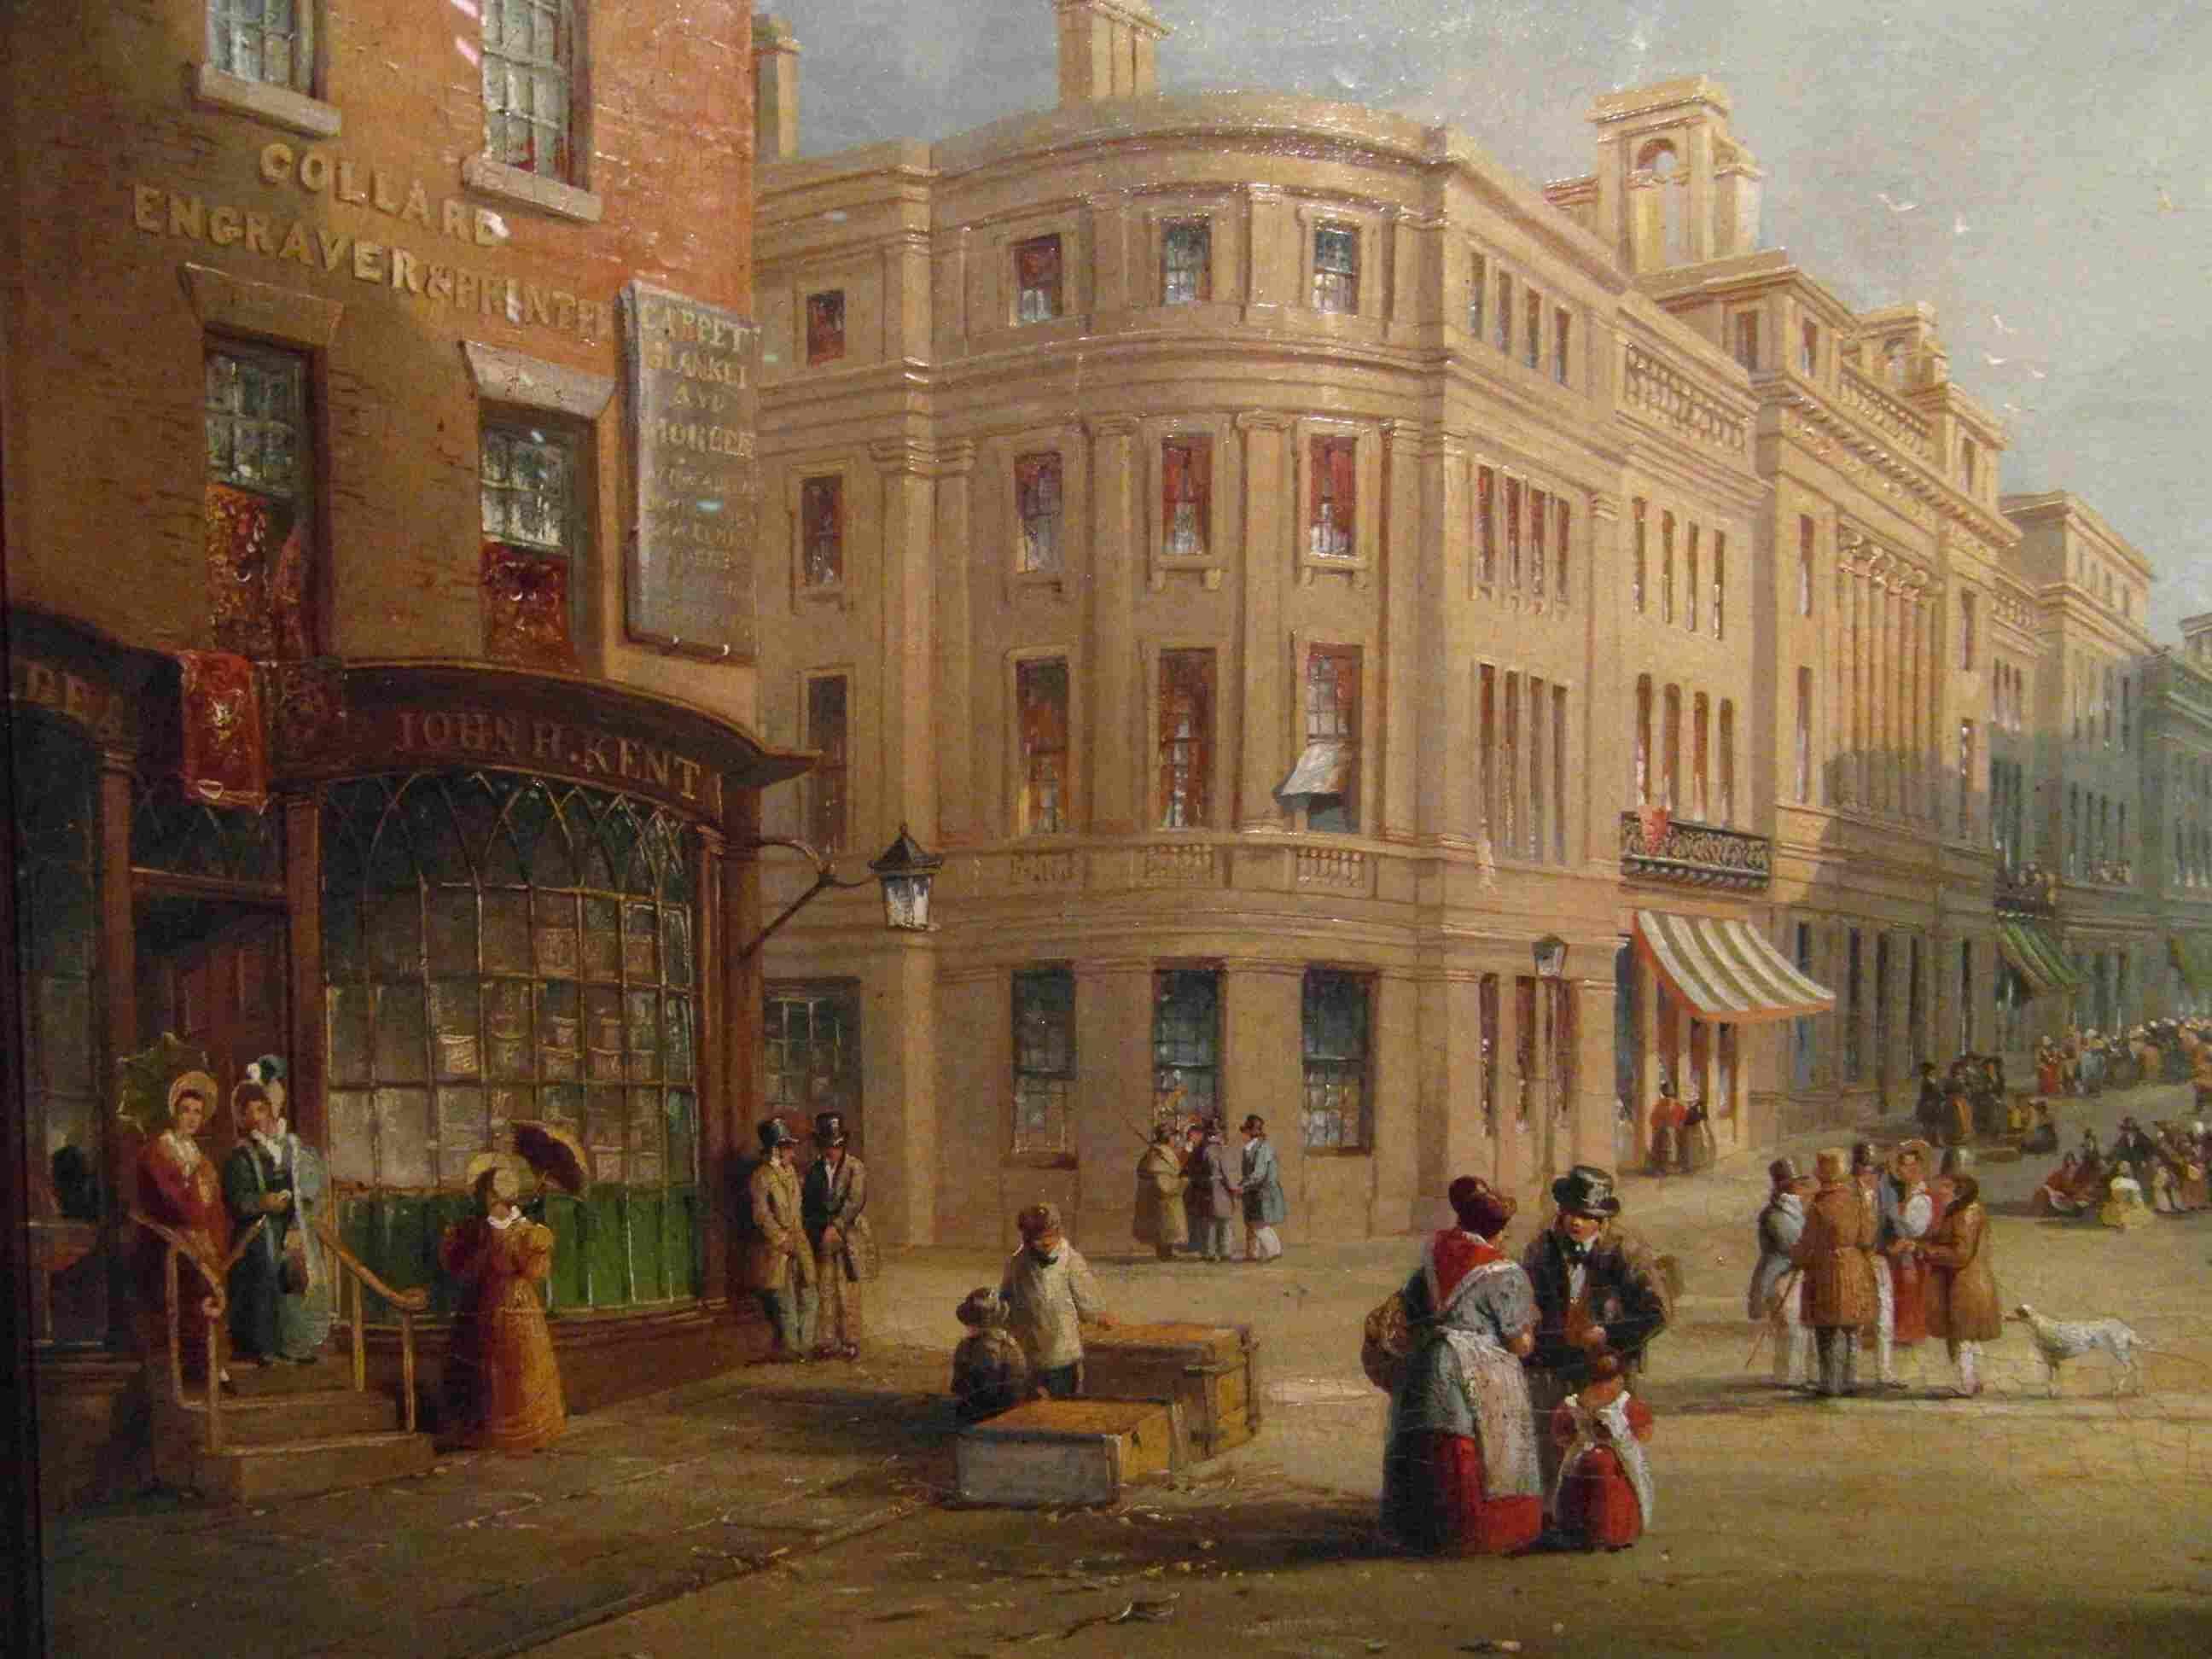 Richard Grainger's vision for Grey Street, Newcastle | Tyne & Wear Archives & Museums Blog